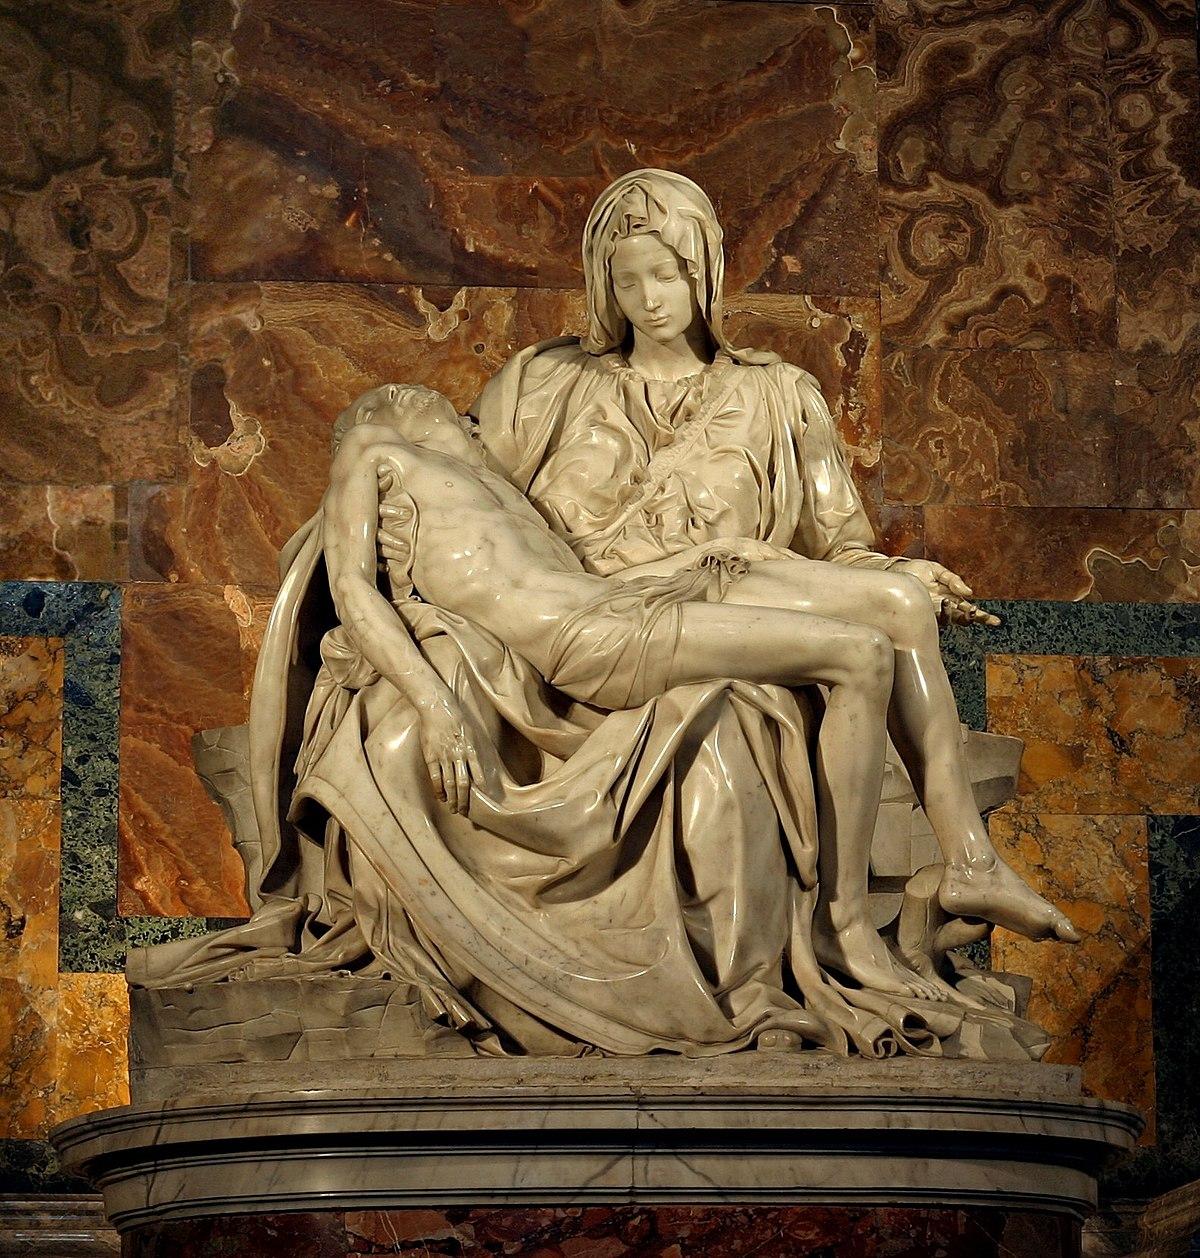 Michelangelo's Pieta 5450 cropncleaned edit.jpg